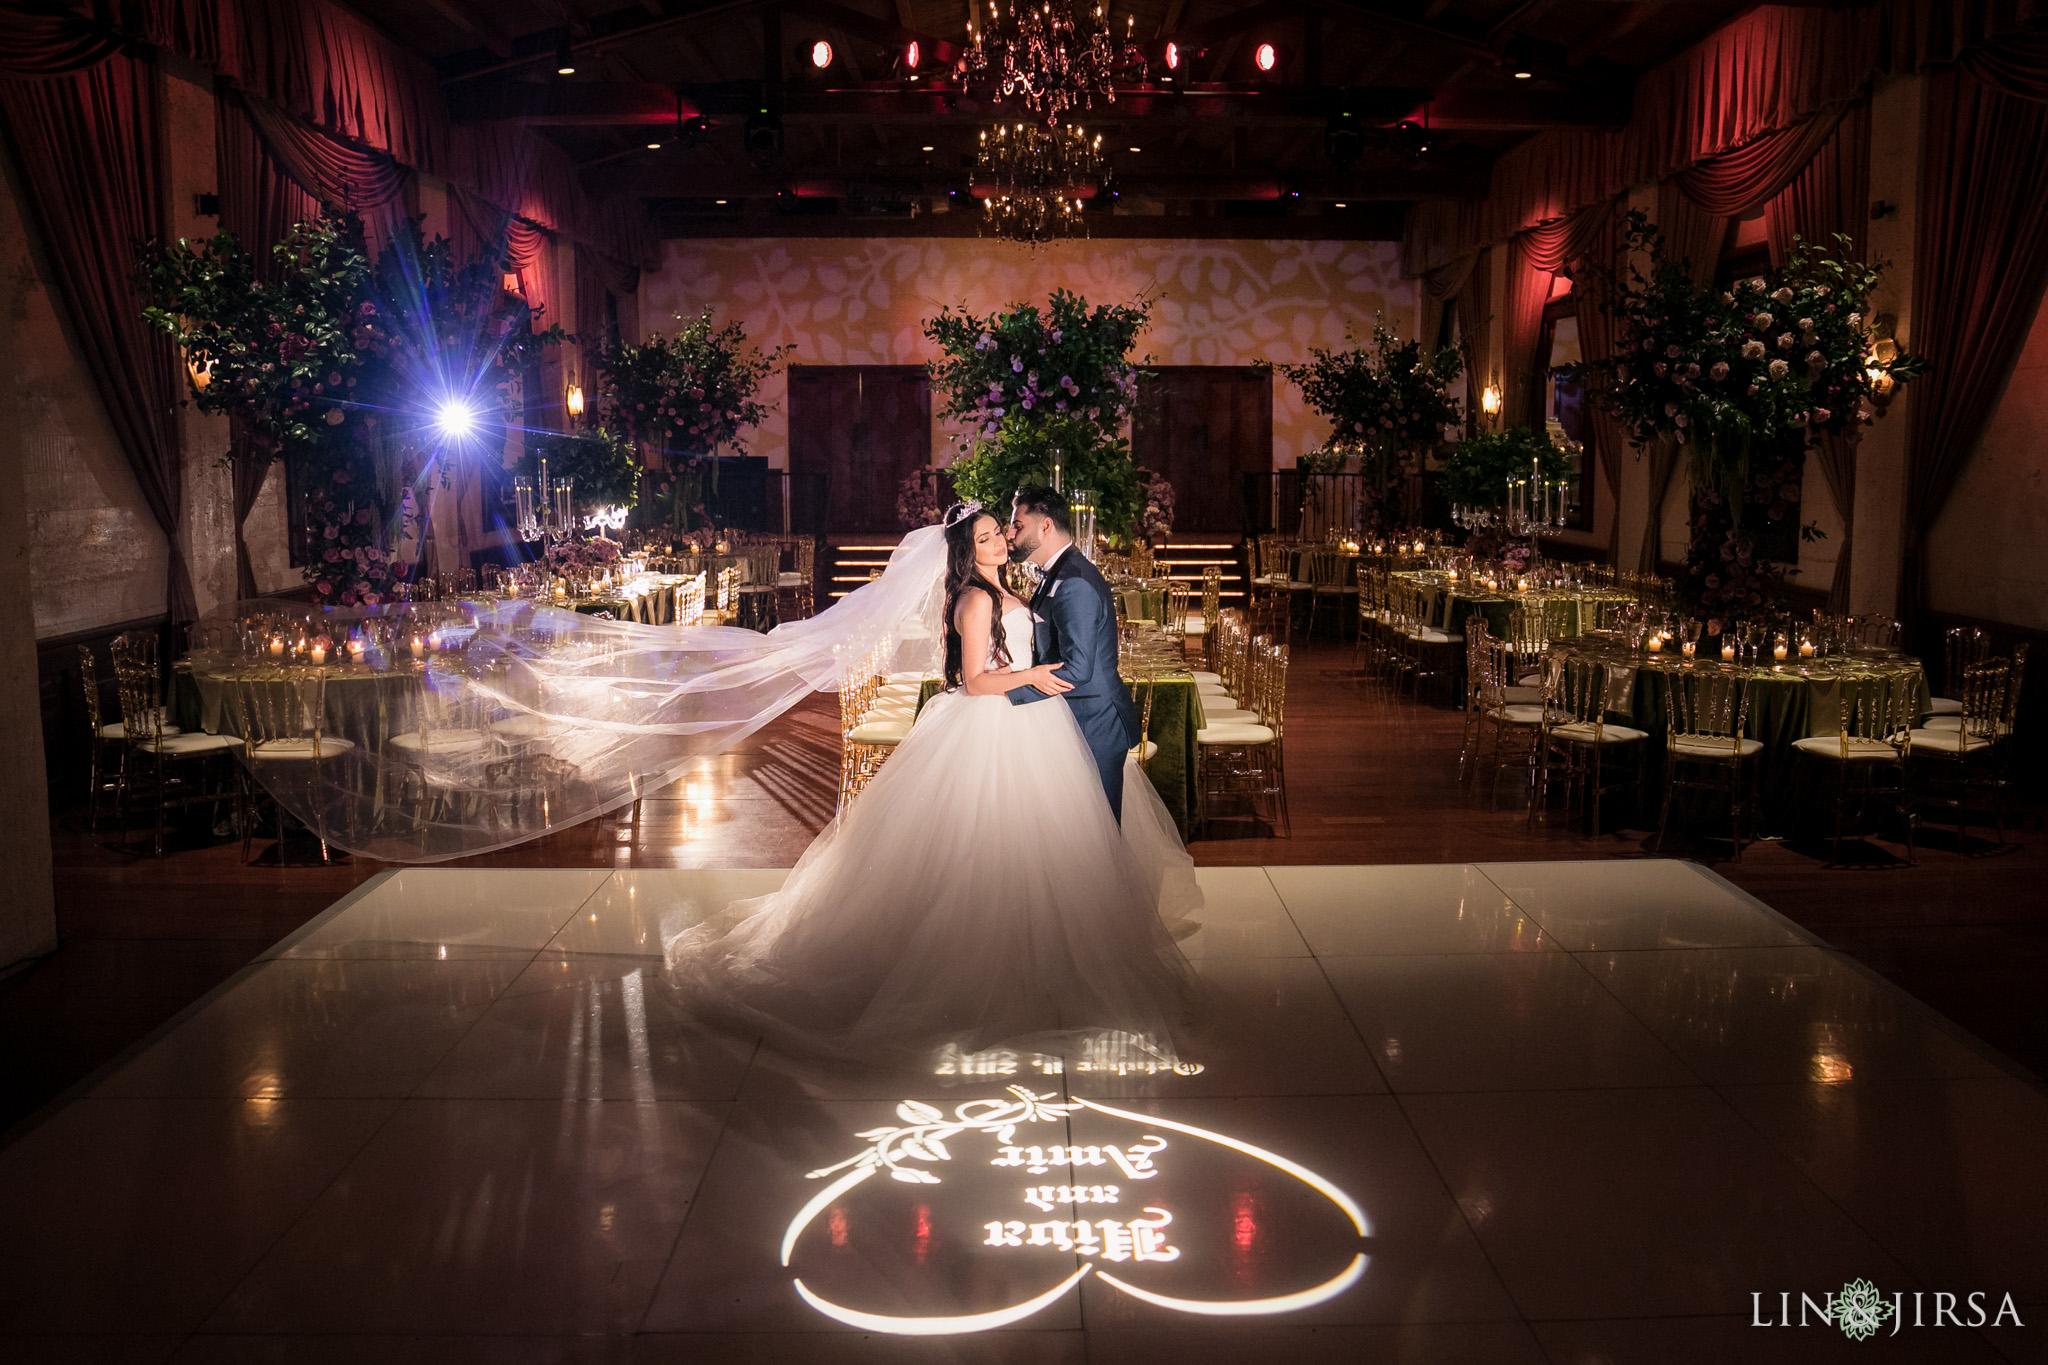 Wedding Ceremonies At Padua Hills Theatre